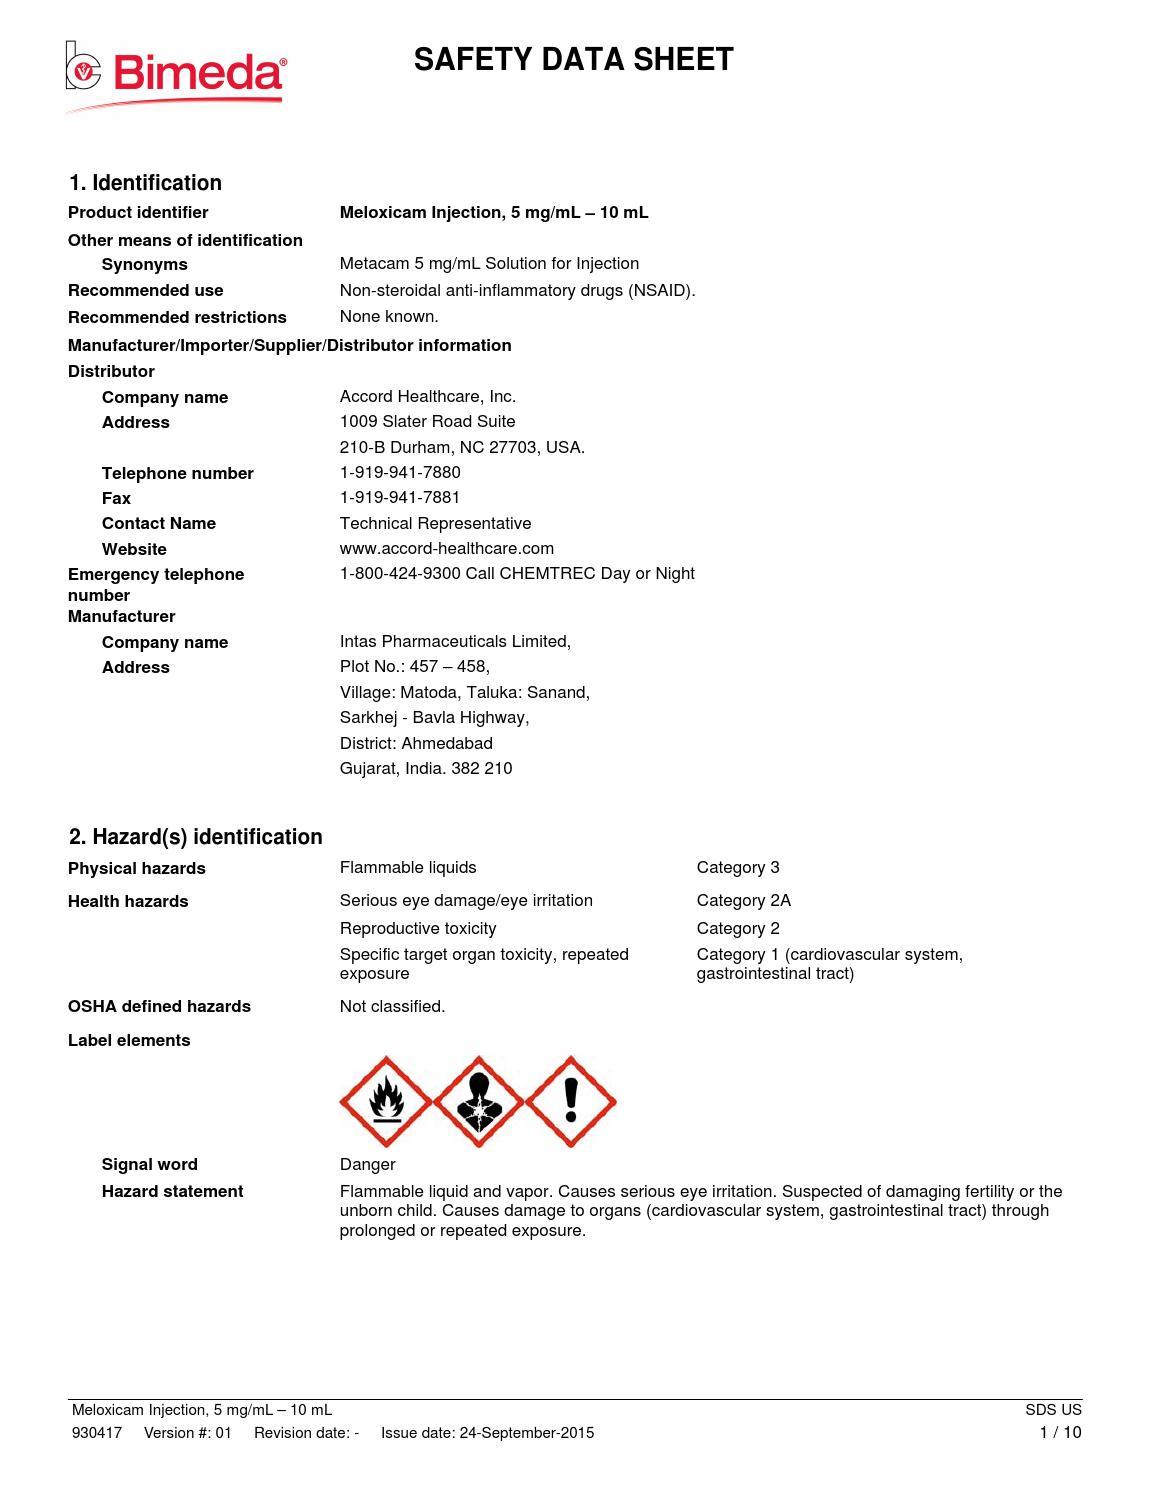 1mel001 safety sheet by Cross Vetpharm Group Ltd - issuu